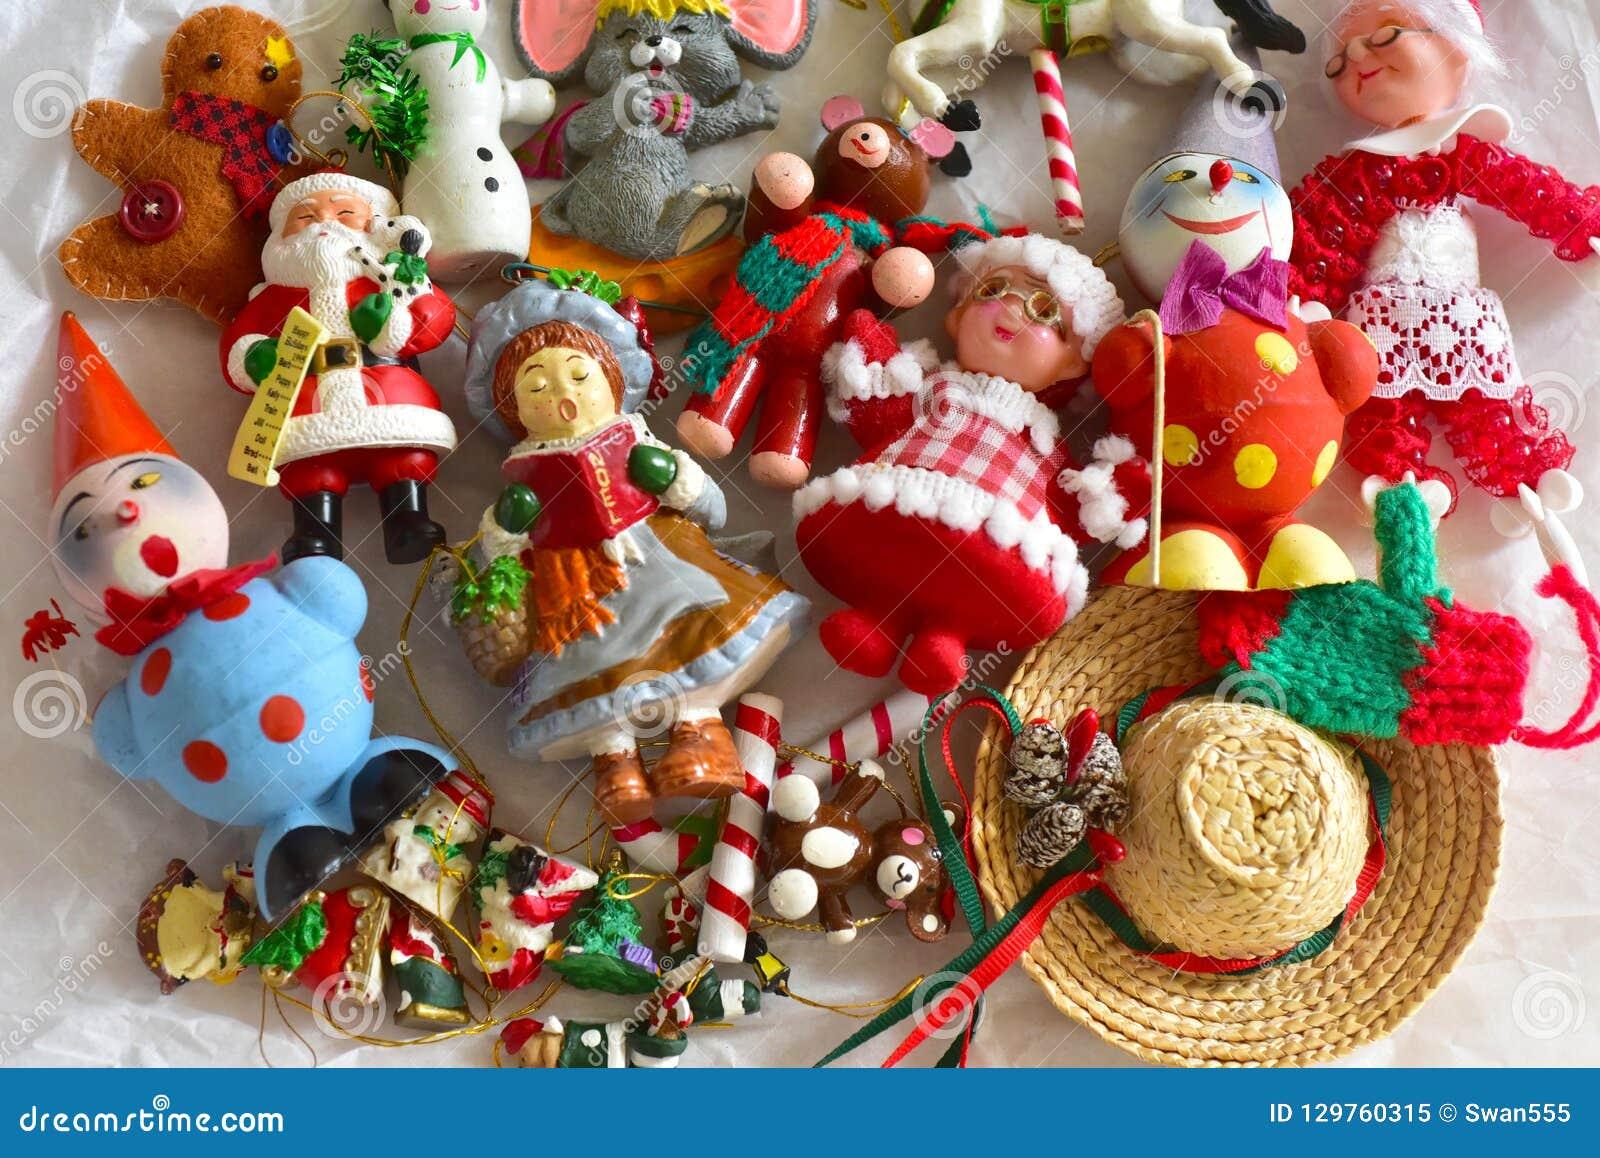 Vintage Christmas Tree Ornaments Stock Image Image Of Holiday White 129760315